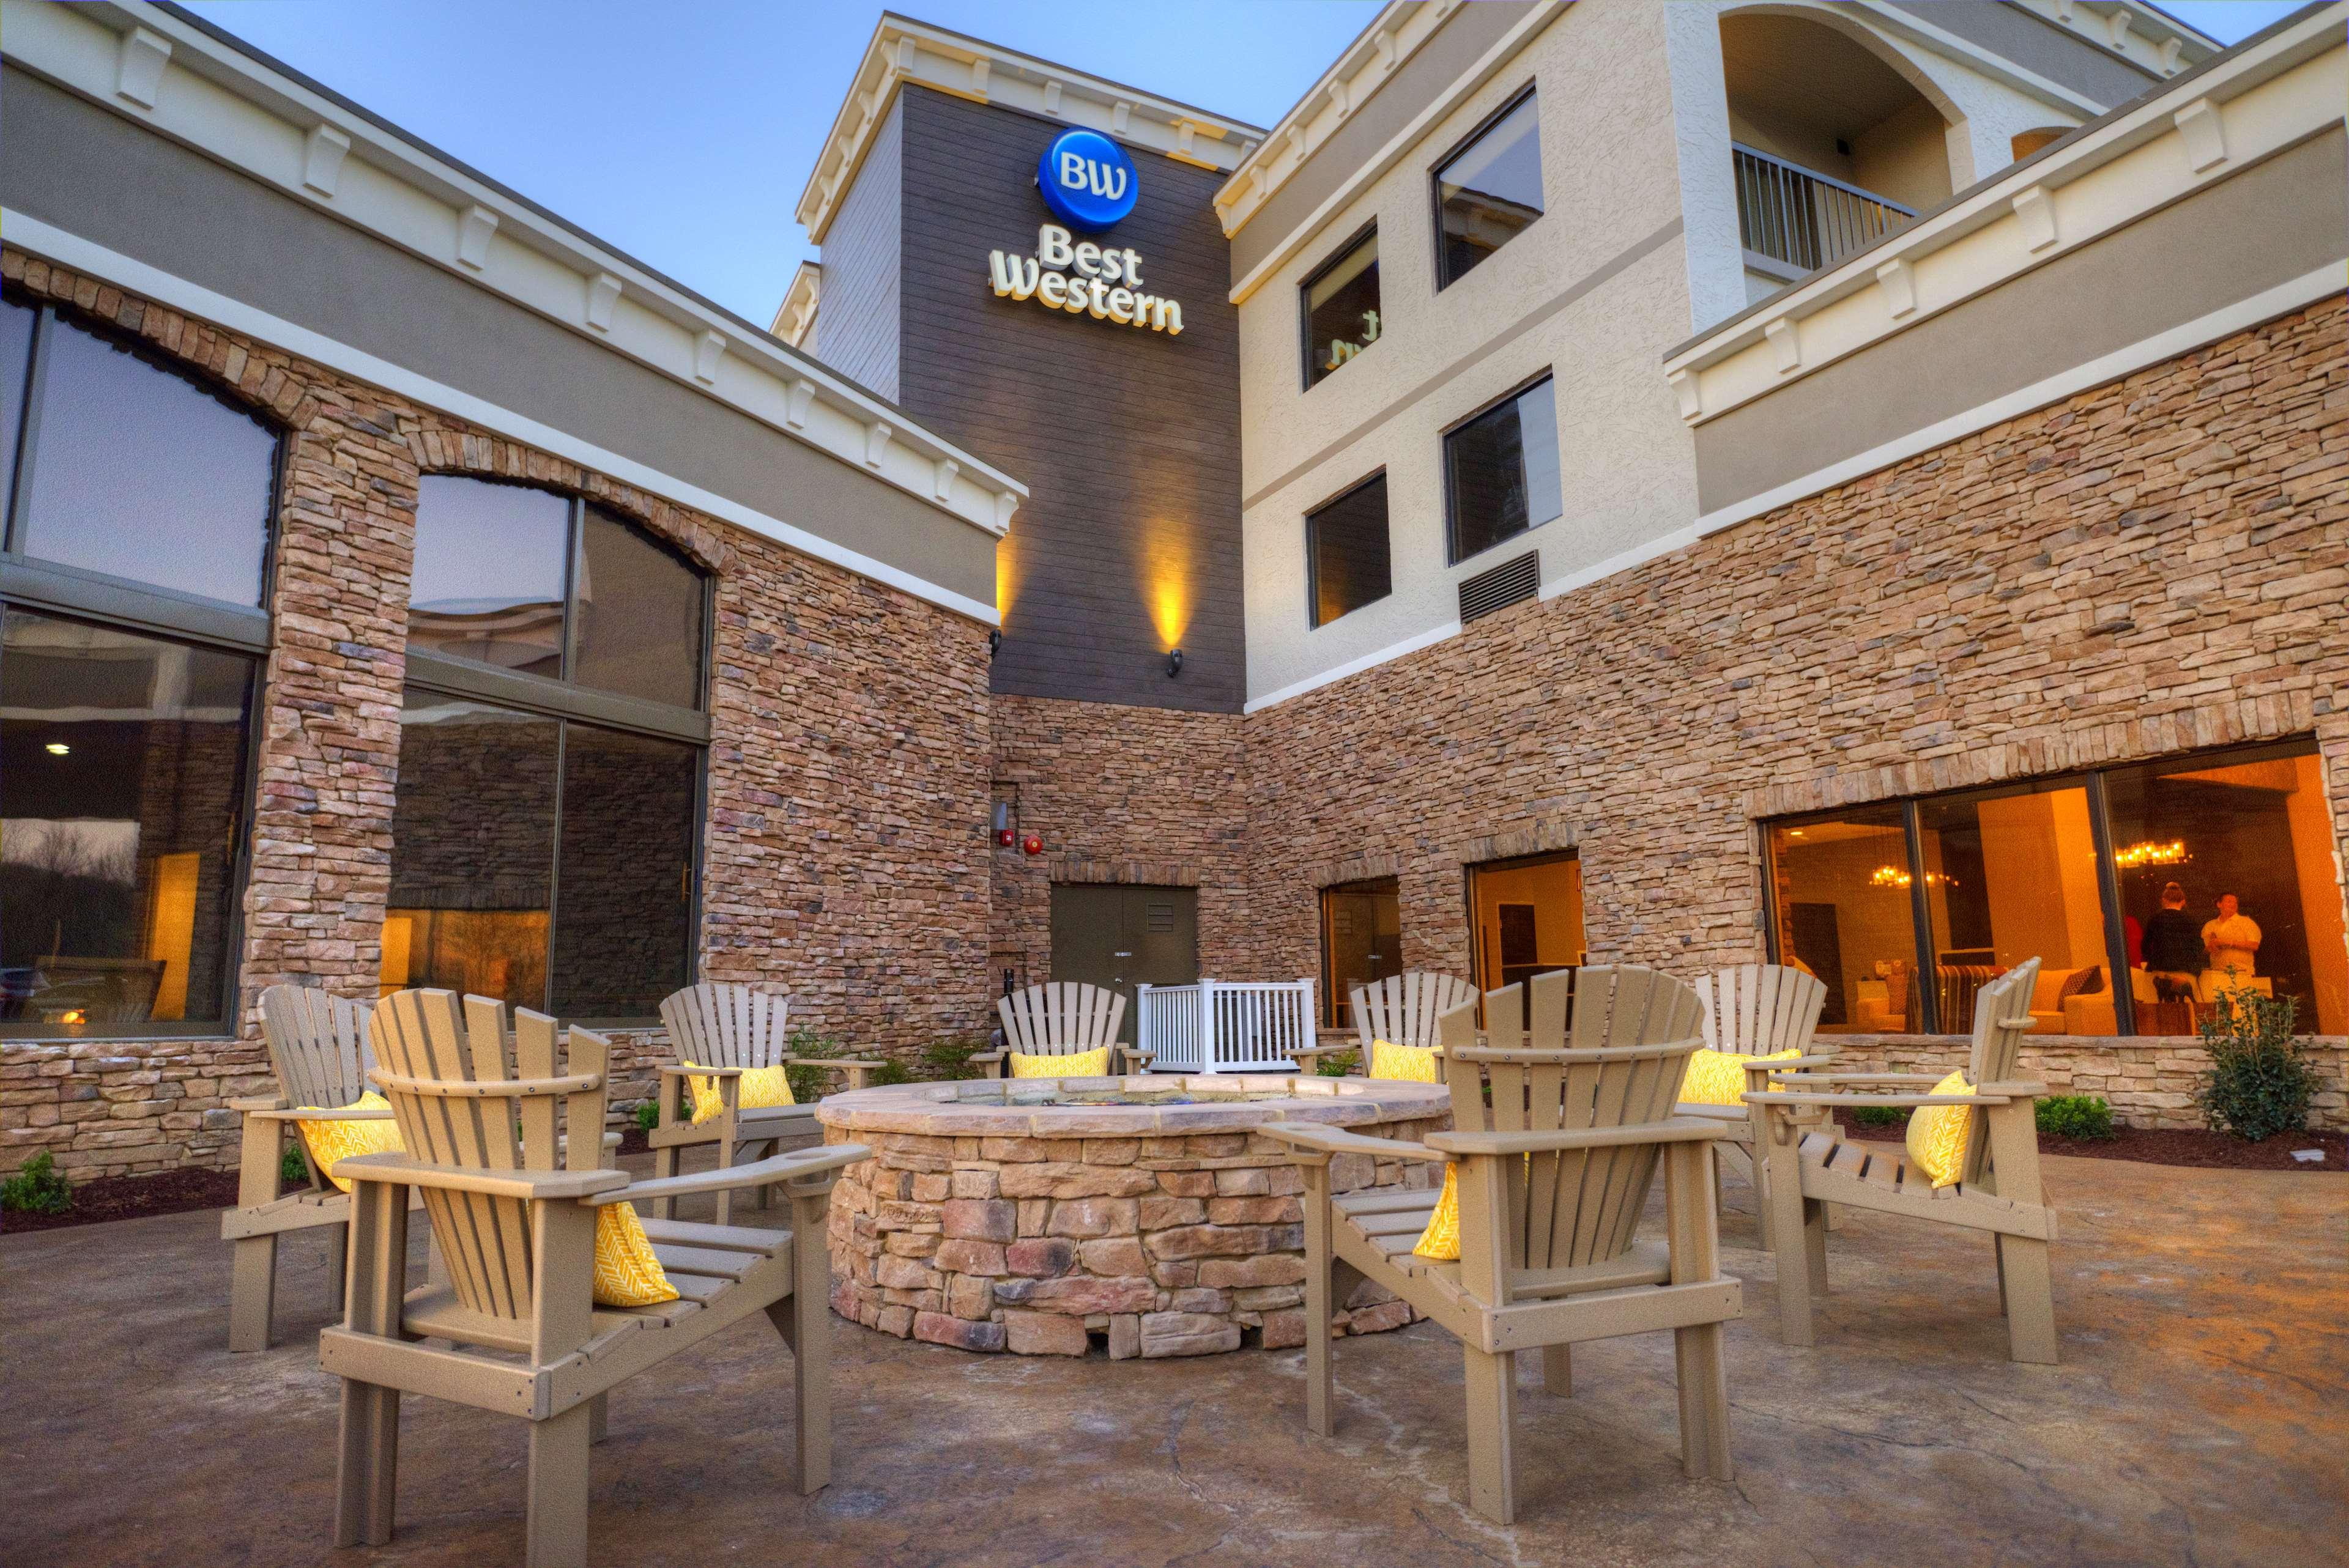 Best Western Sevierville  Kodak Inn  Kodak Tennessee  Tn